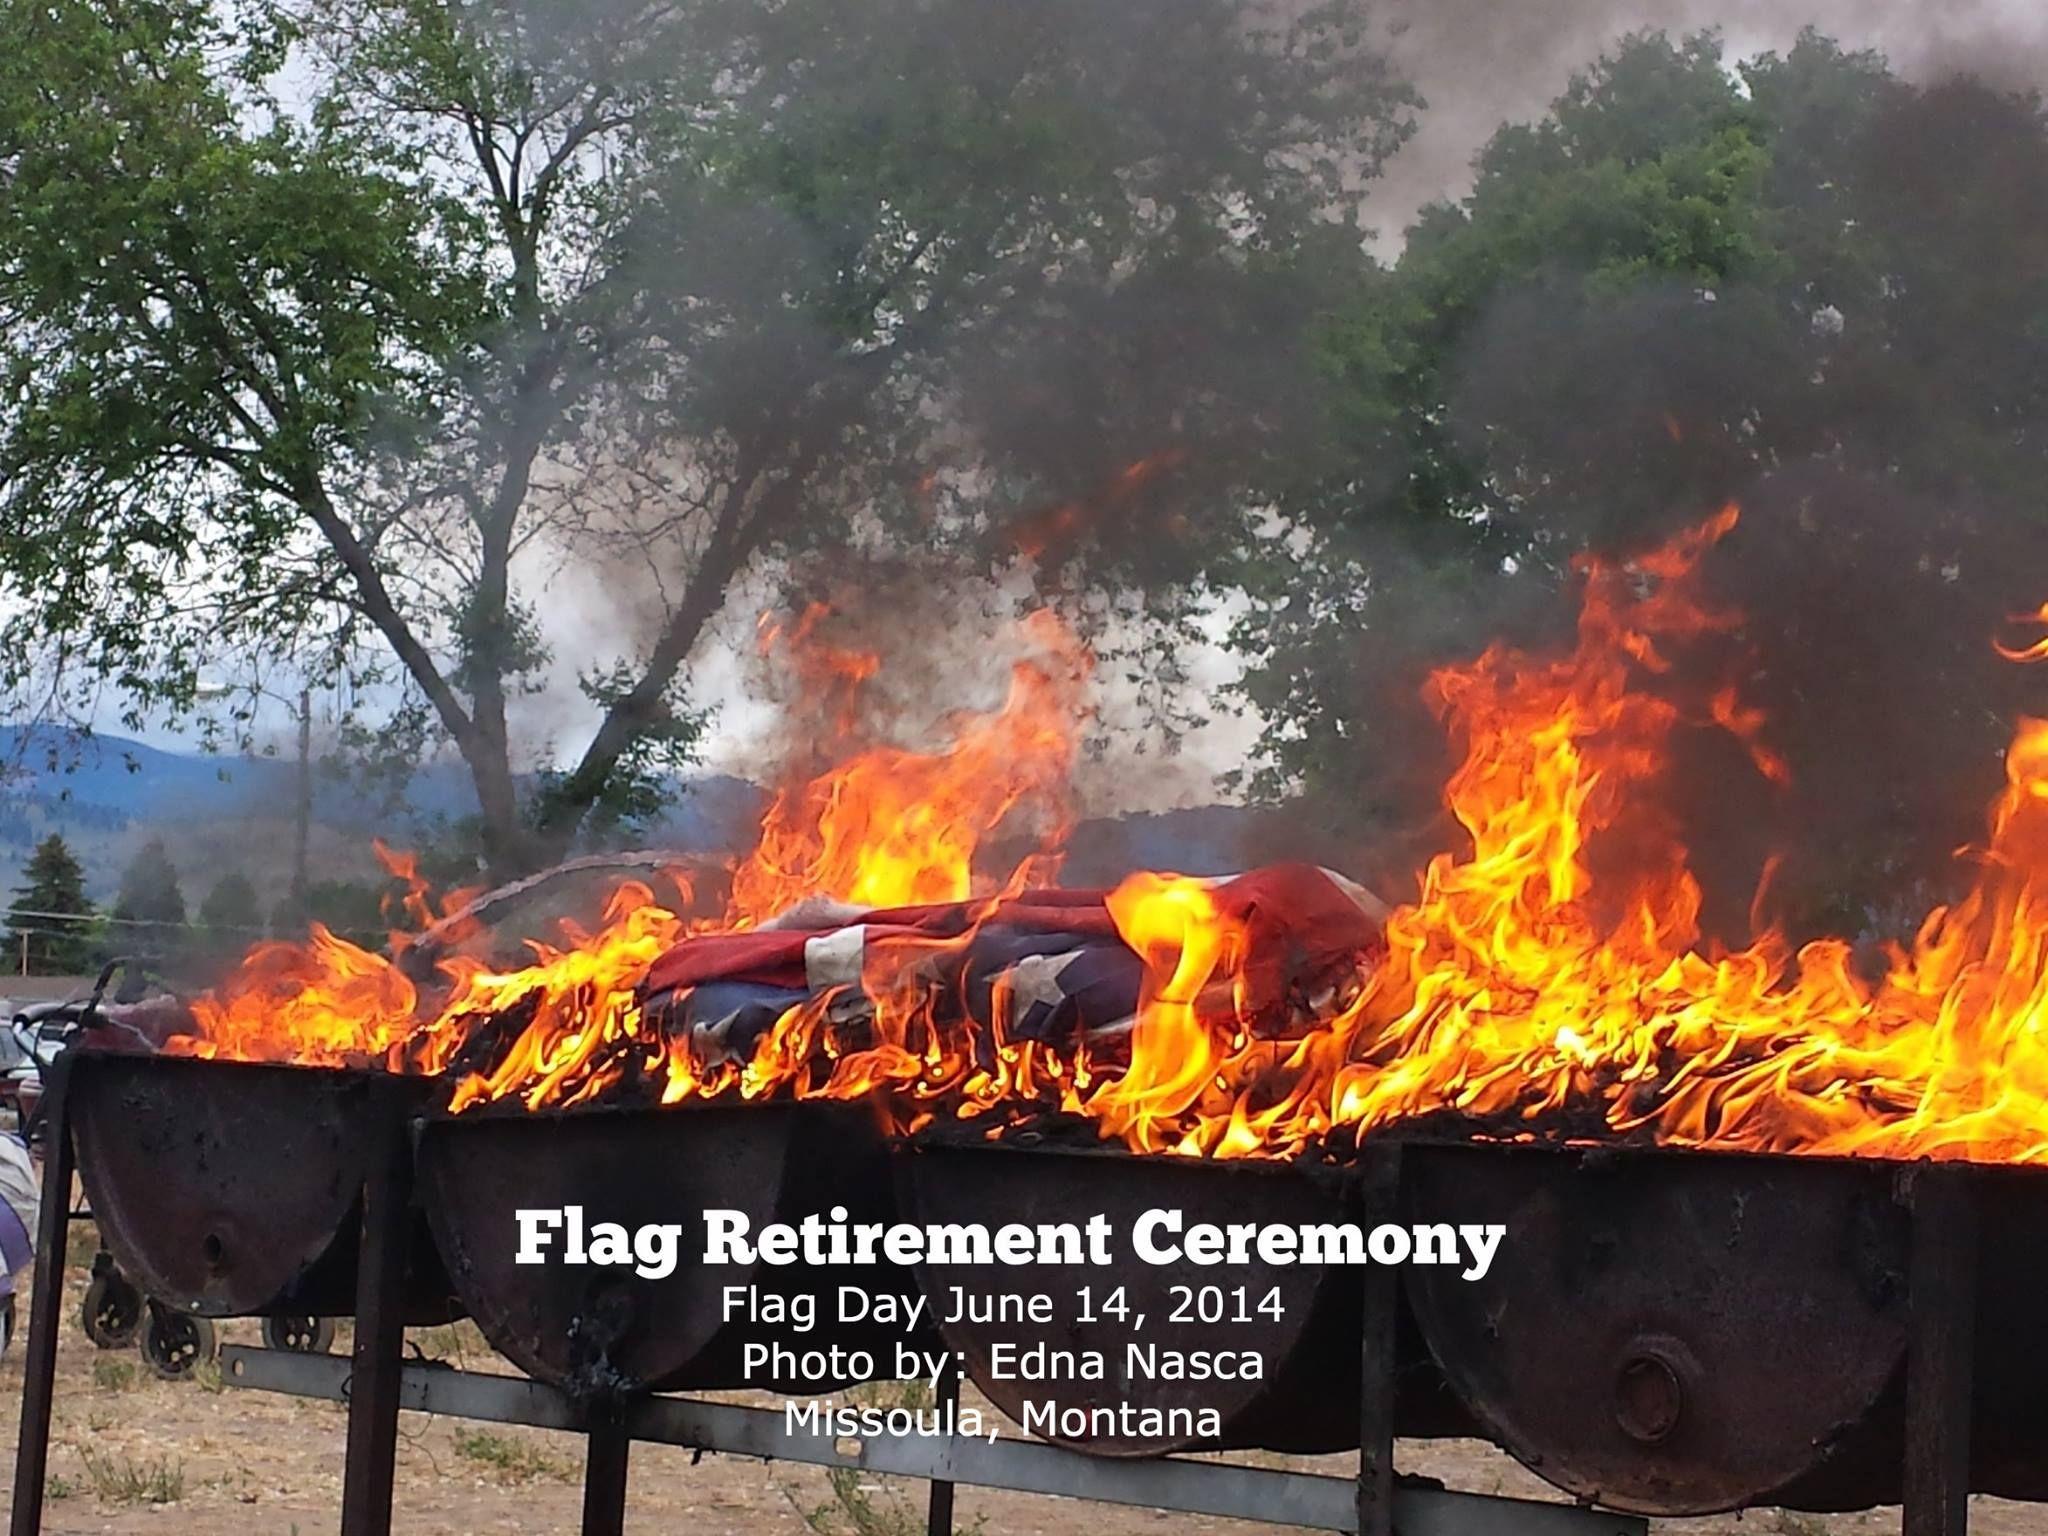 Flag retirement ceremony missoula montana june 14 2014